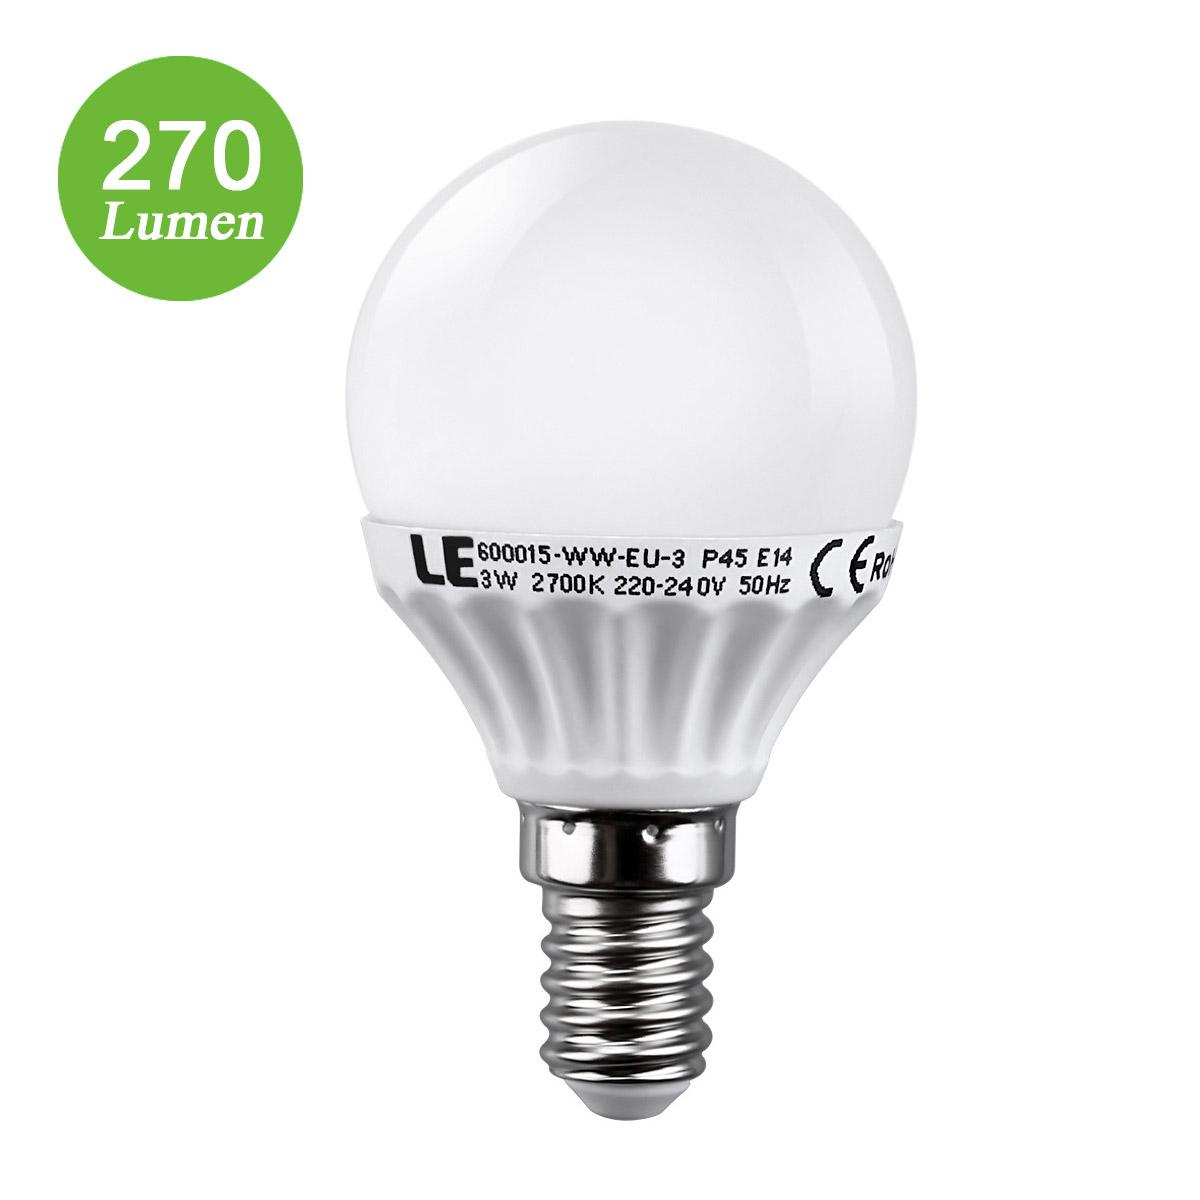 3W E14 P45 LED Birnen, 270lm Golfball Lampen, ersetzt 25W Glühlampe, Warmweiß